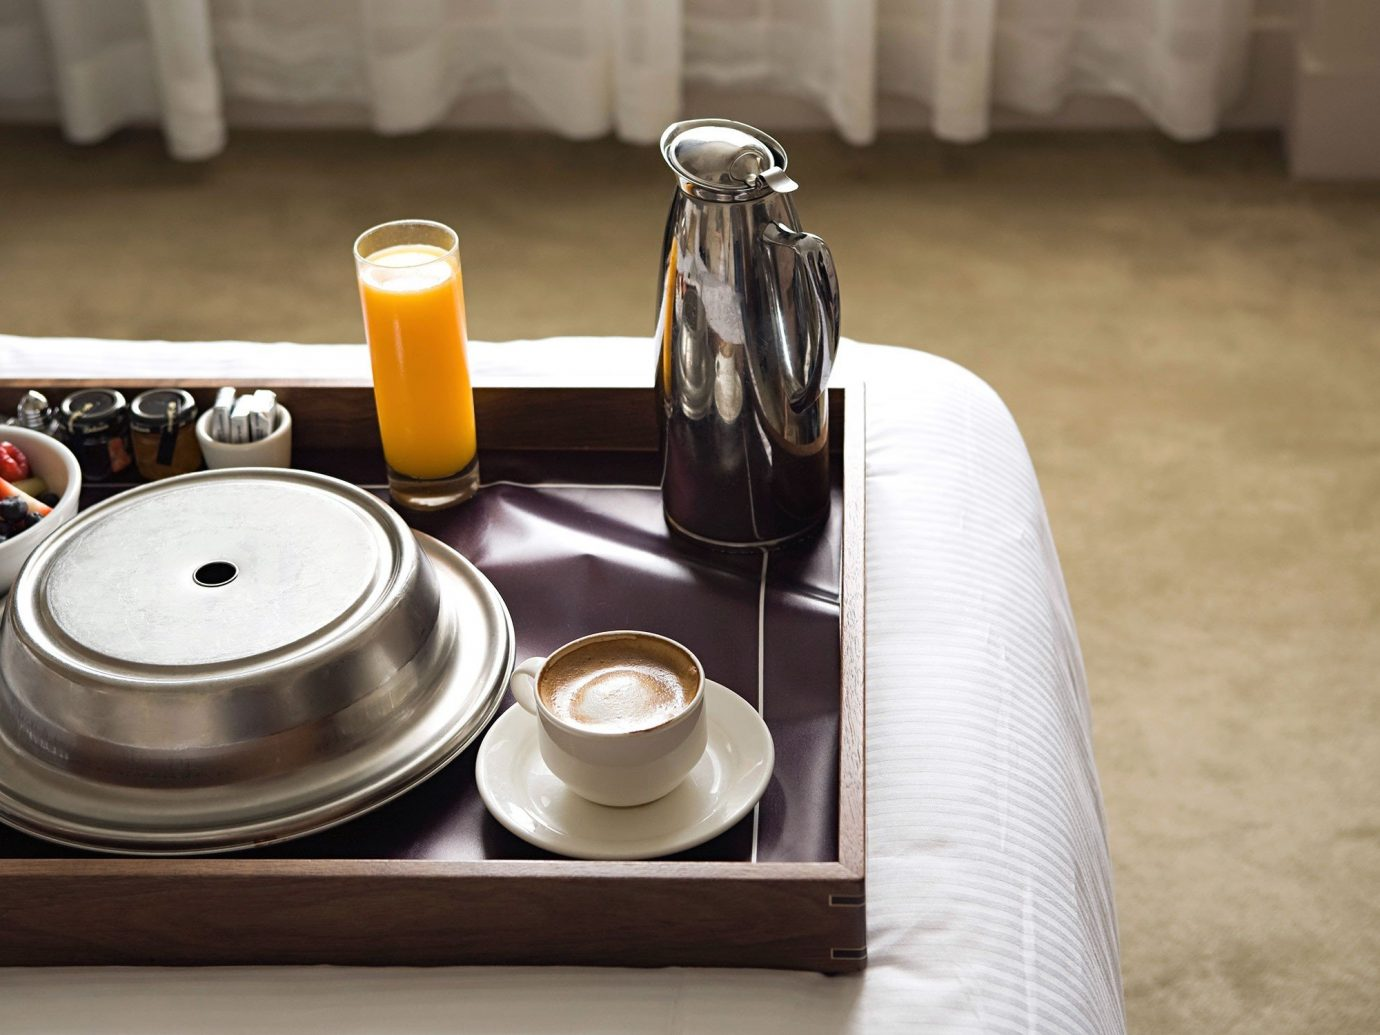 Offbeat table indoor coffee cup floor meal Drink food breakfast